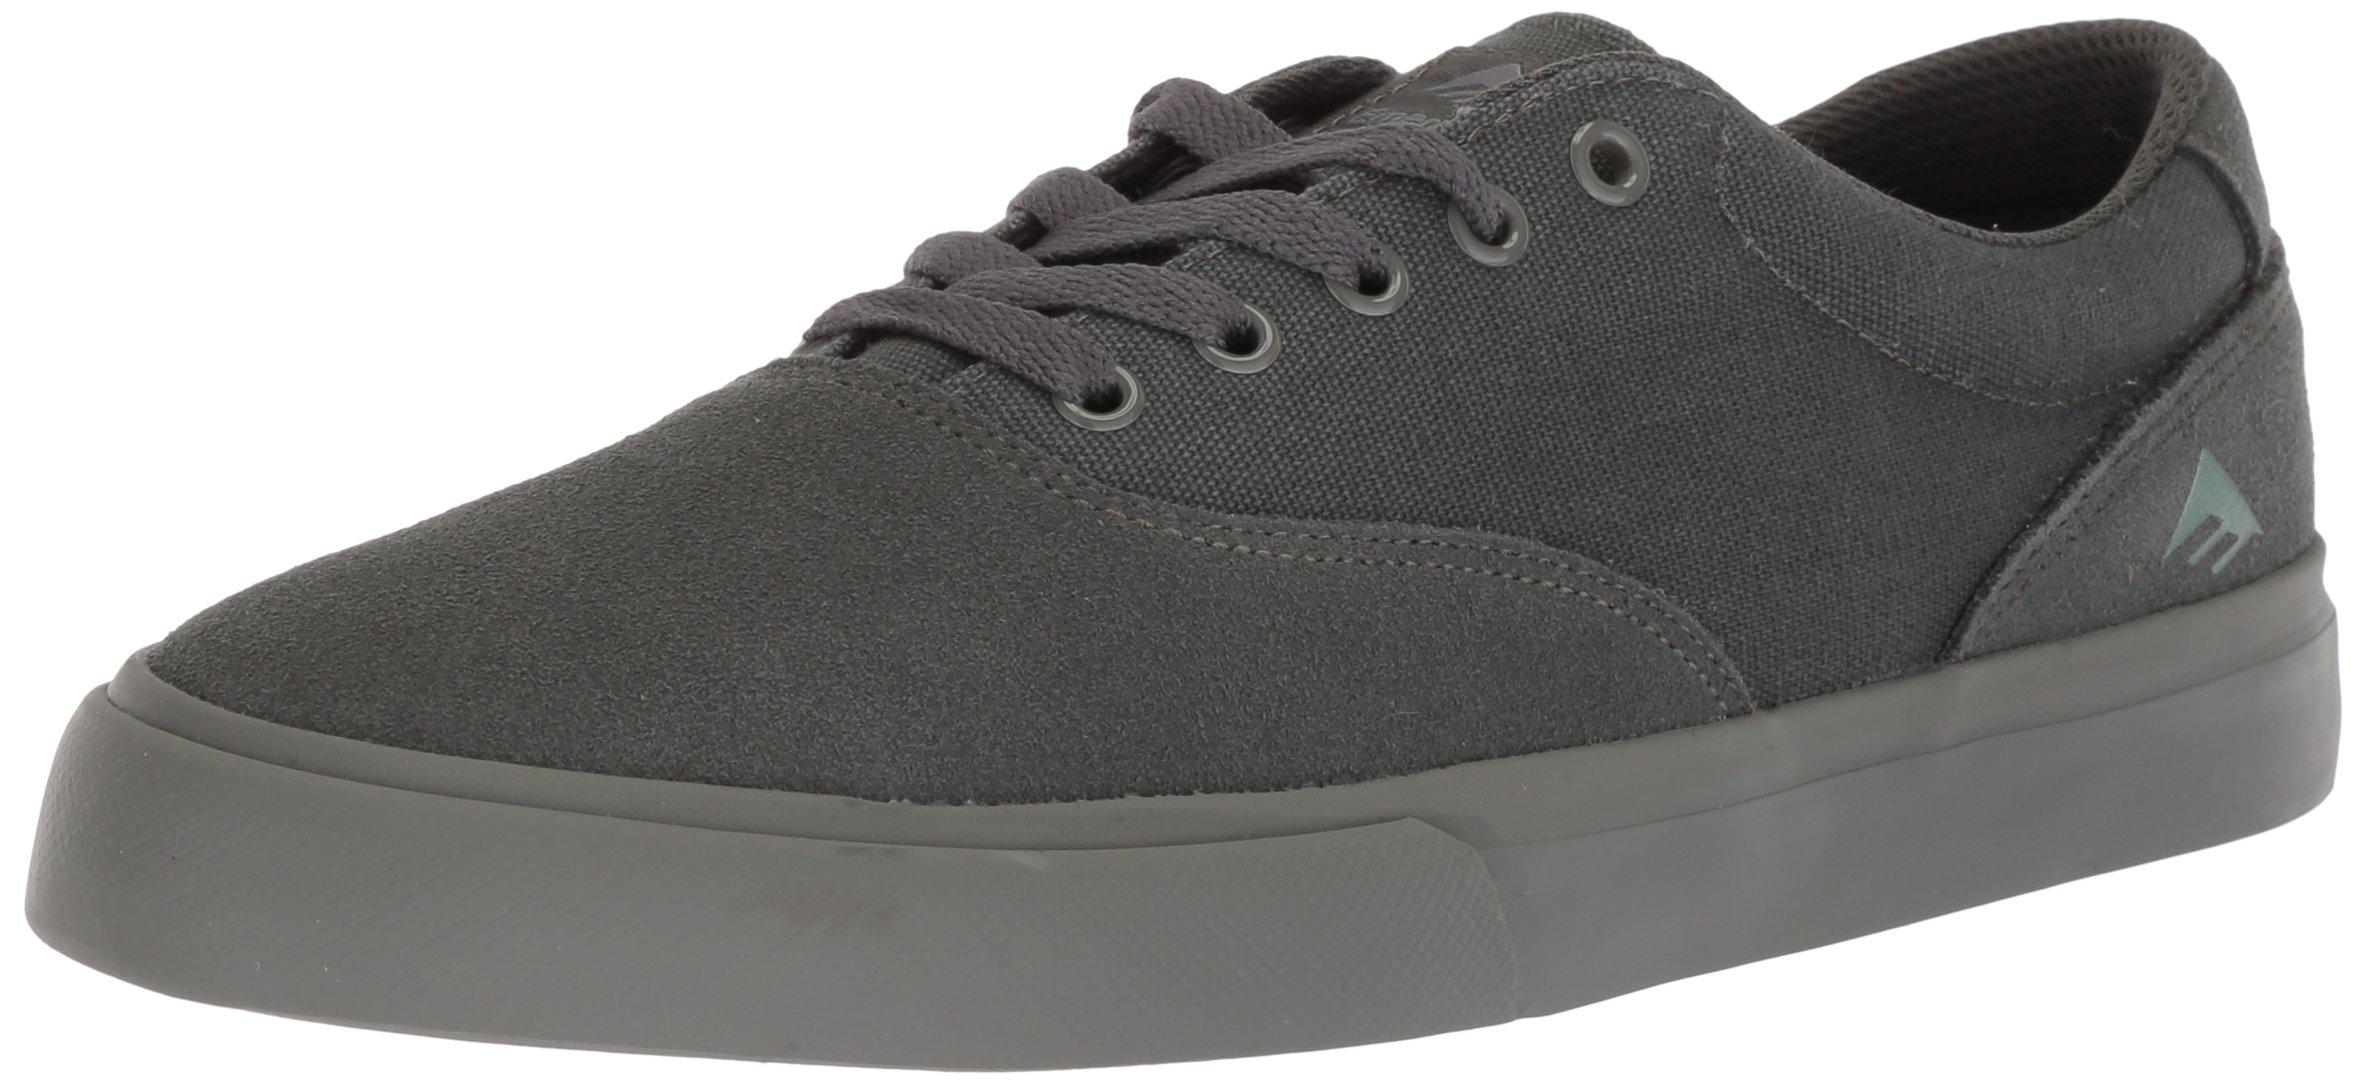 Emerica Provost Slim Vulc Skate Shoe,grey/grey,9